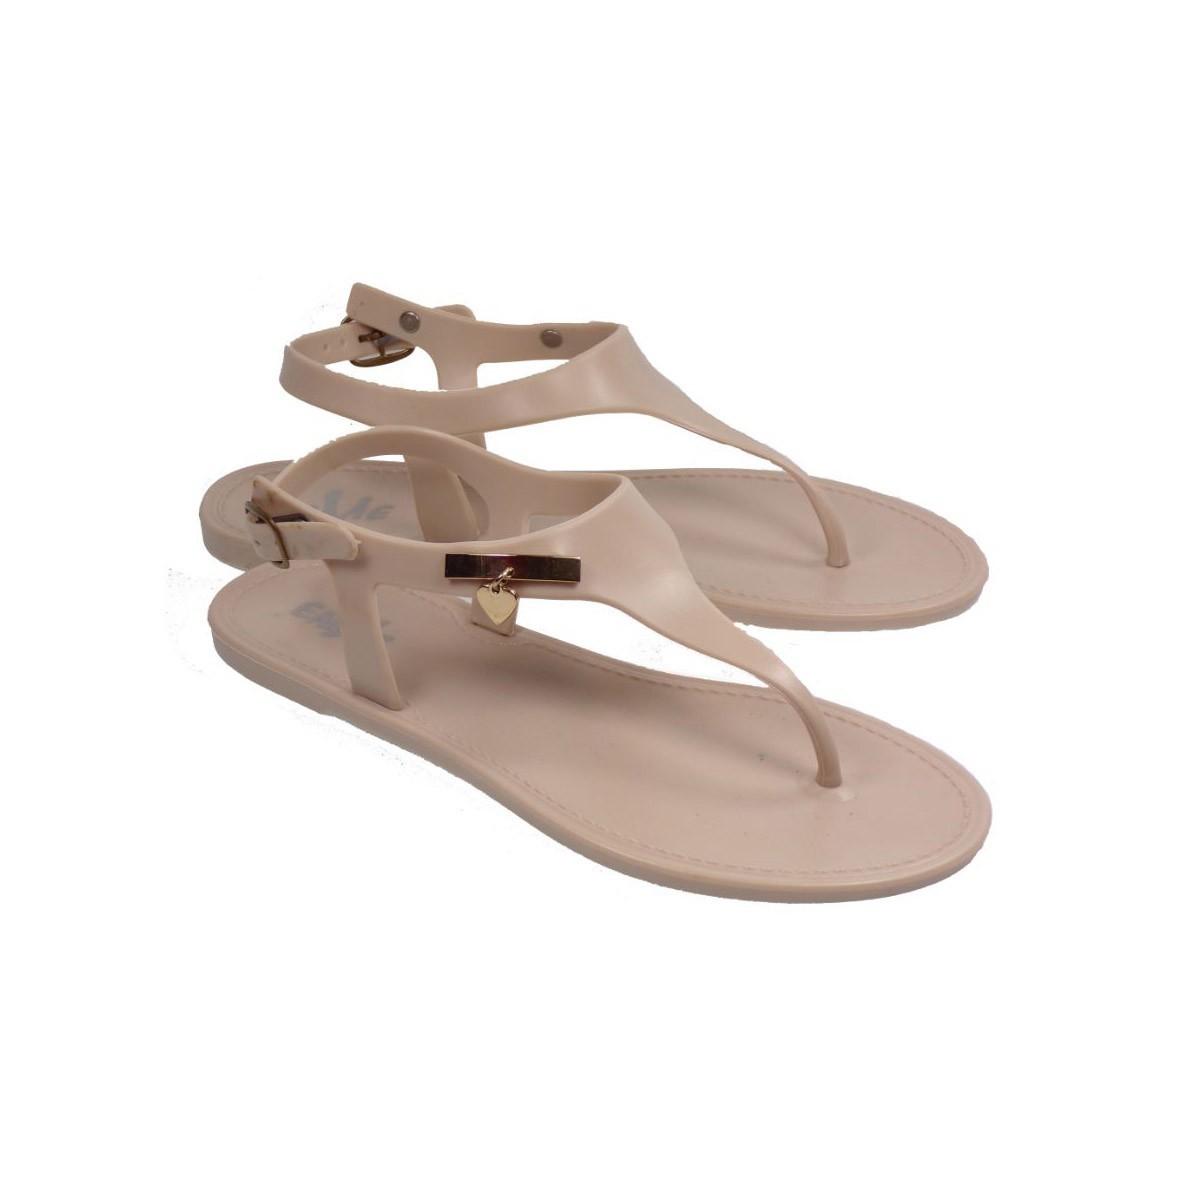 29b8f8621b7 Envie shoes Γυναικεία Πέδιλα 46-5050 Μπεζ